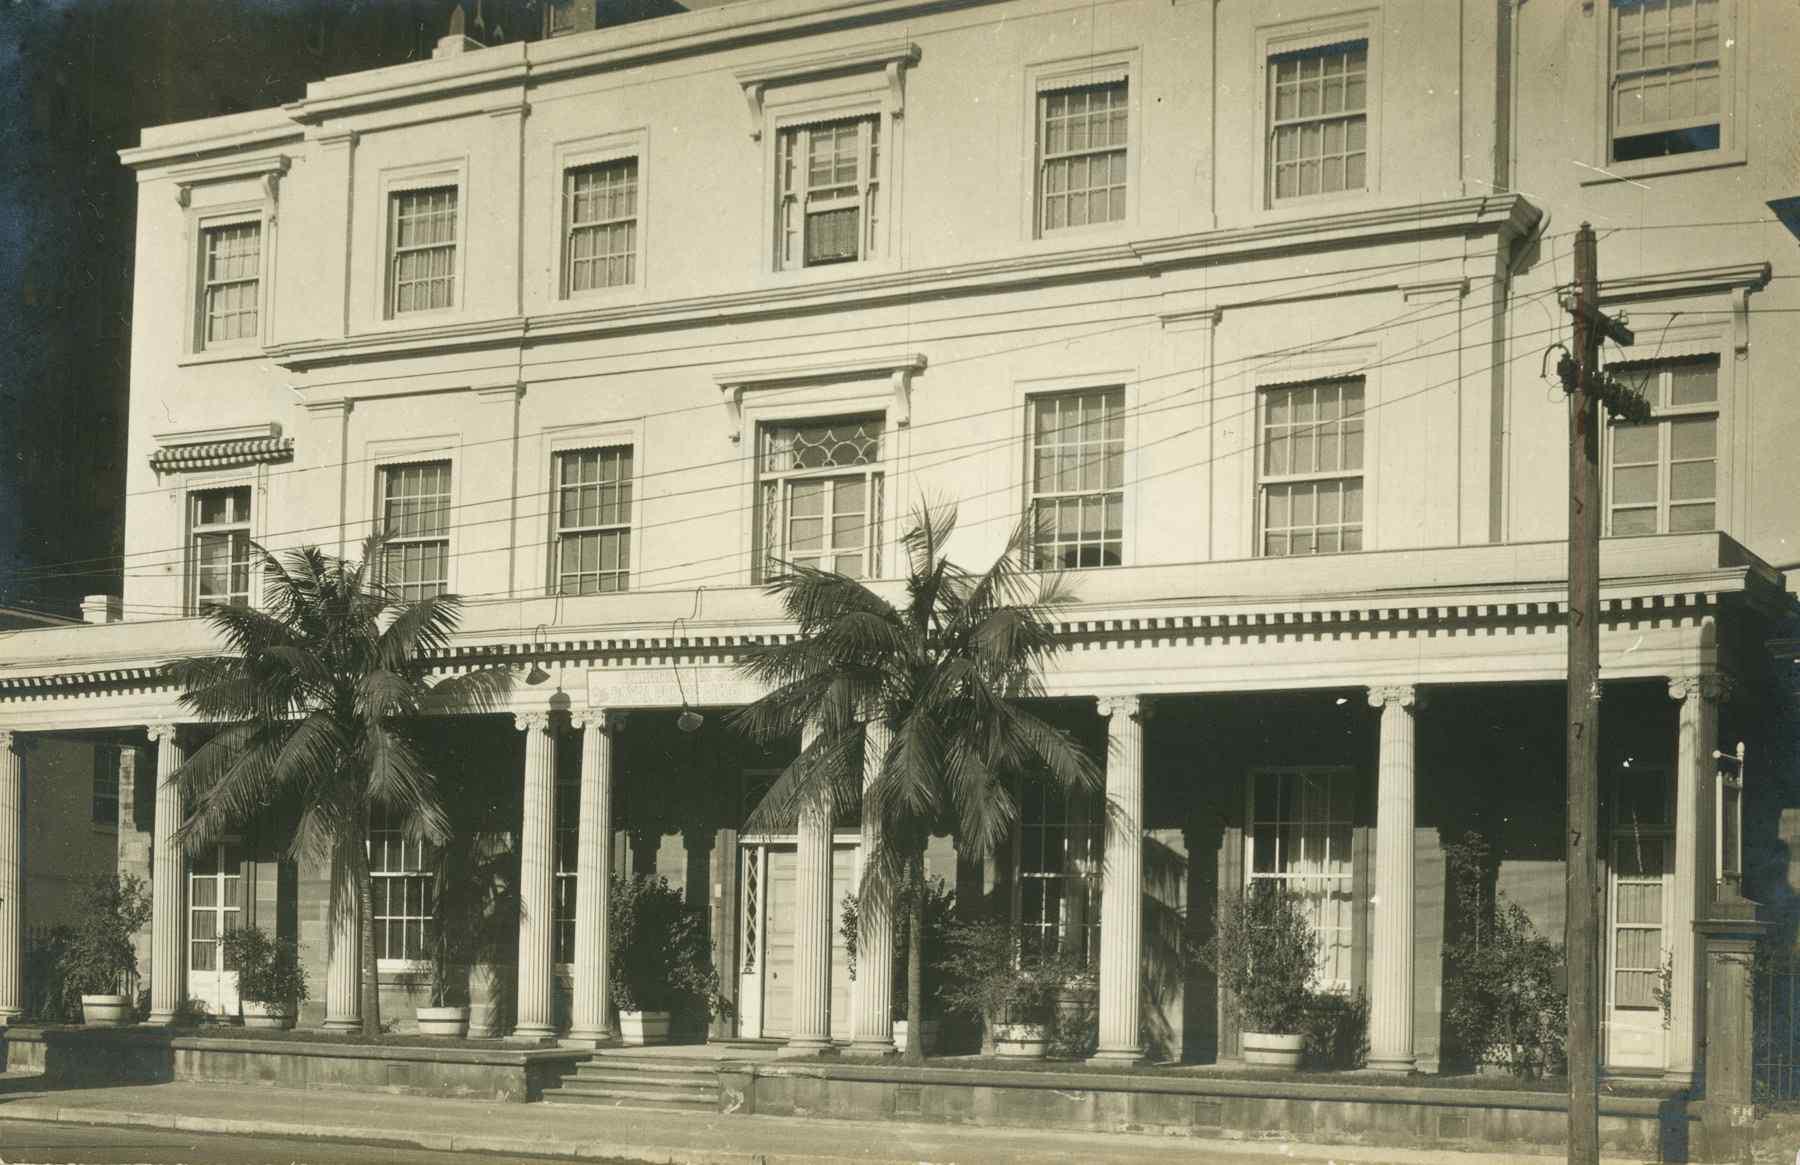 Burdekin House/Historic Houses Trust